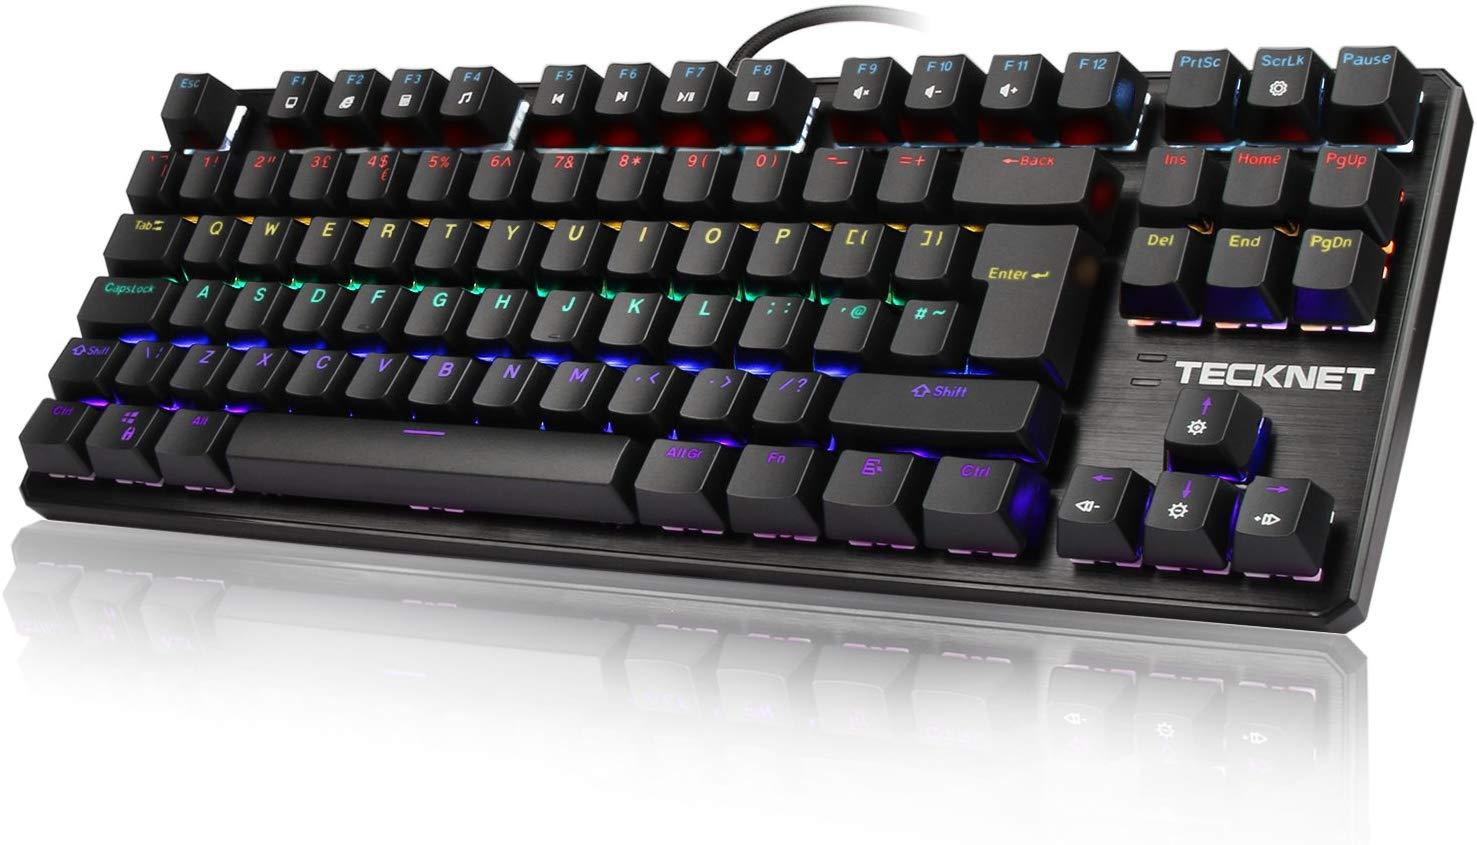 TeckNet Mechanical Keyboard 88 Keys £22.94 @ Sold by BLUETREE and Fulfilled by Amazon